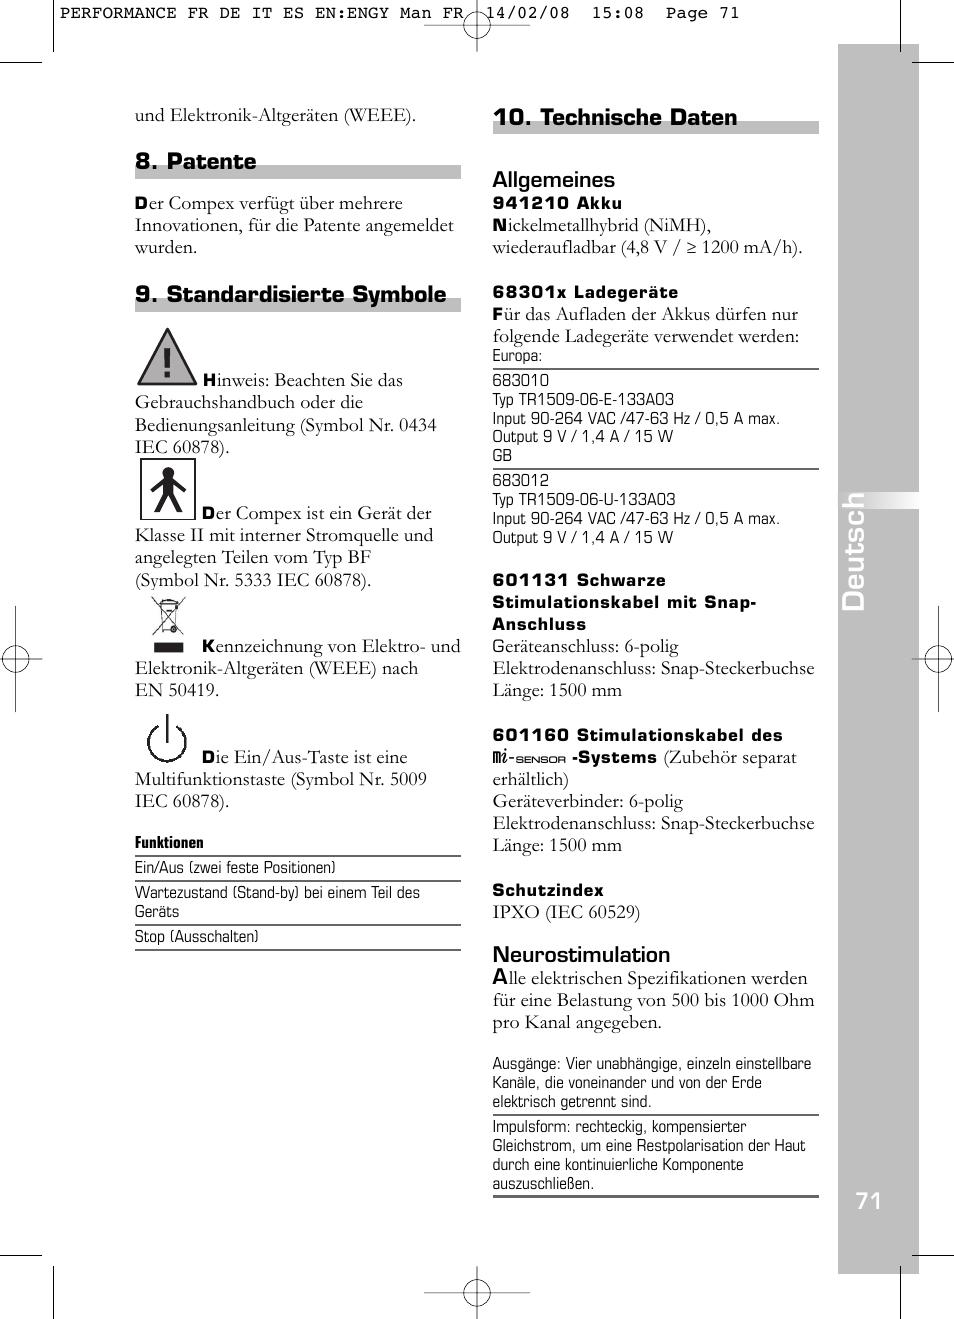 Deutsch, Patente, Standardisierte symbole | Compex Performance User ...